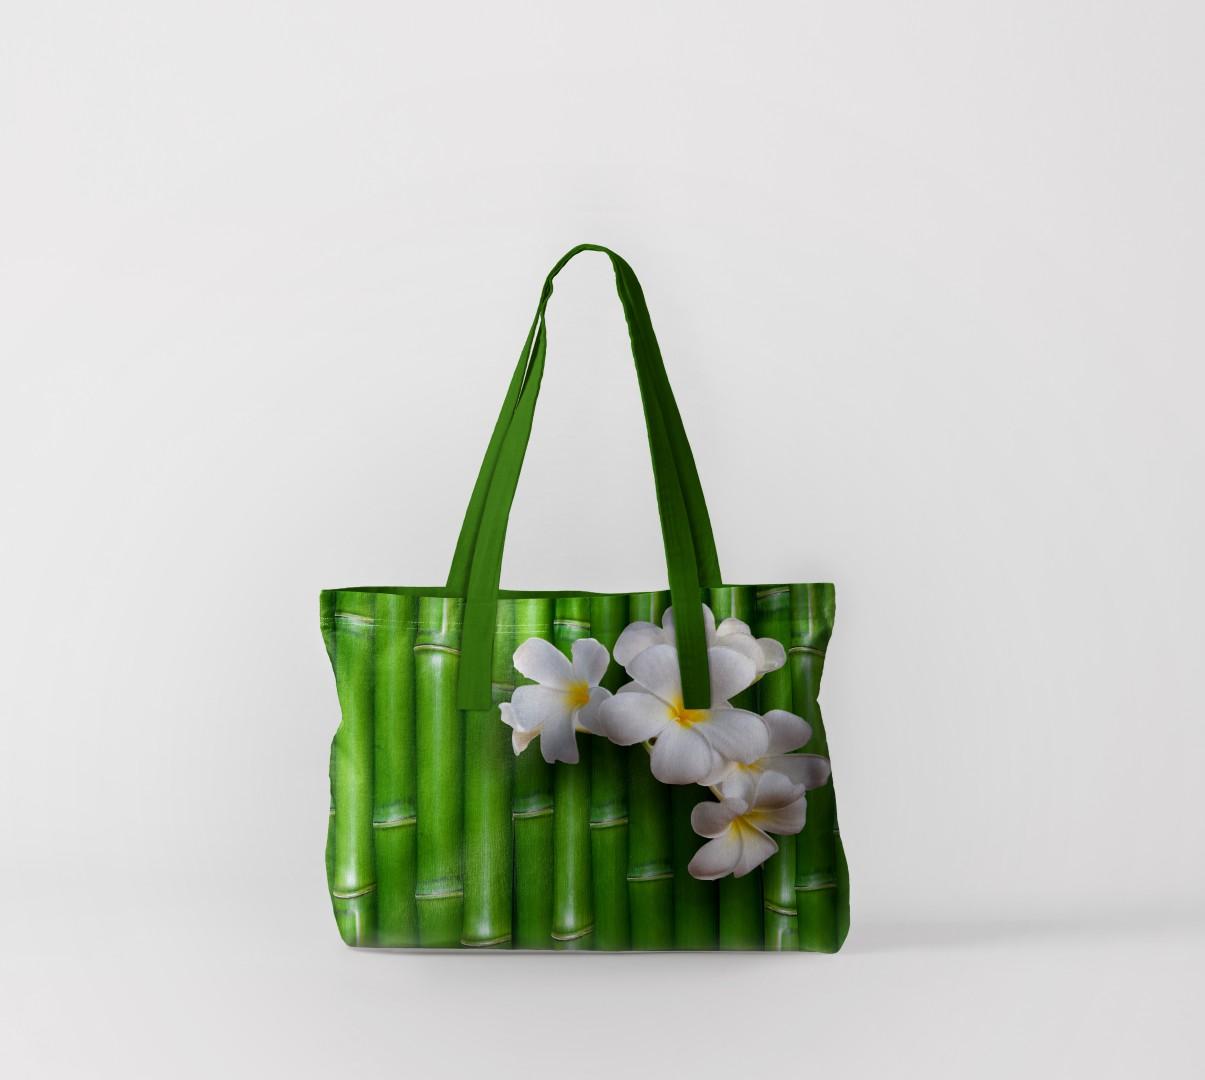 Пляжная сумка Цветы на бамбуке (50х40 см) Олимп Текстиль oli732612